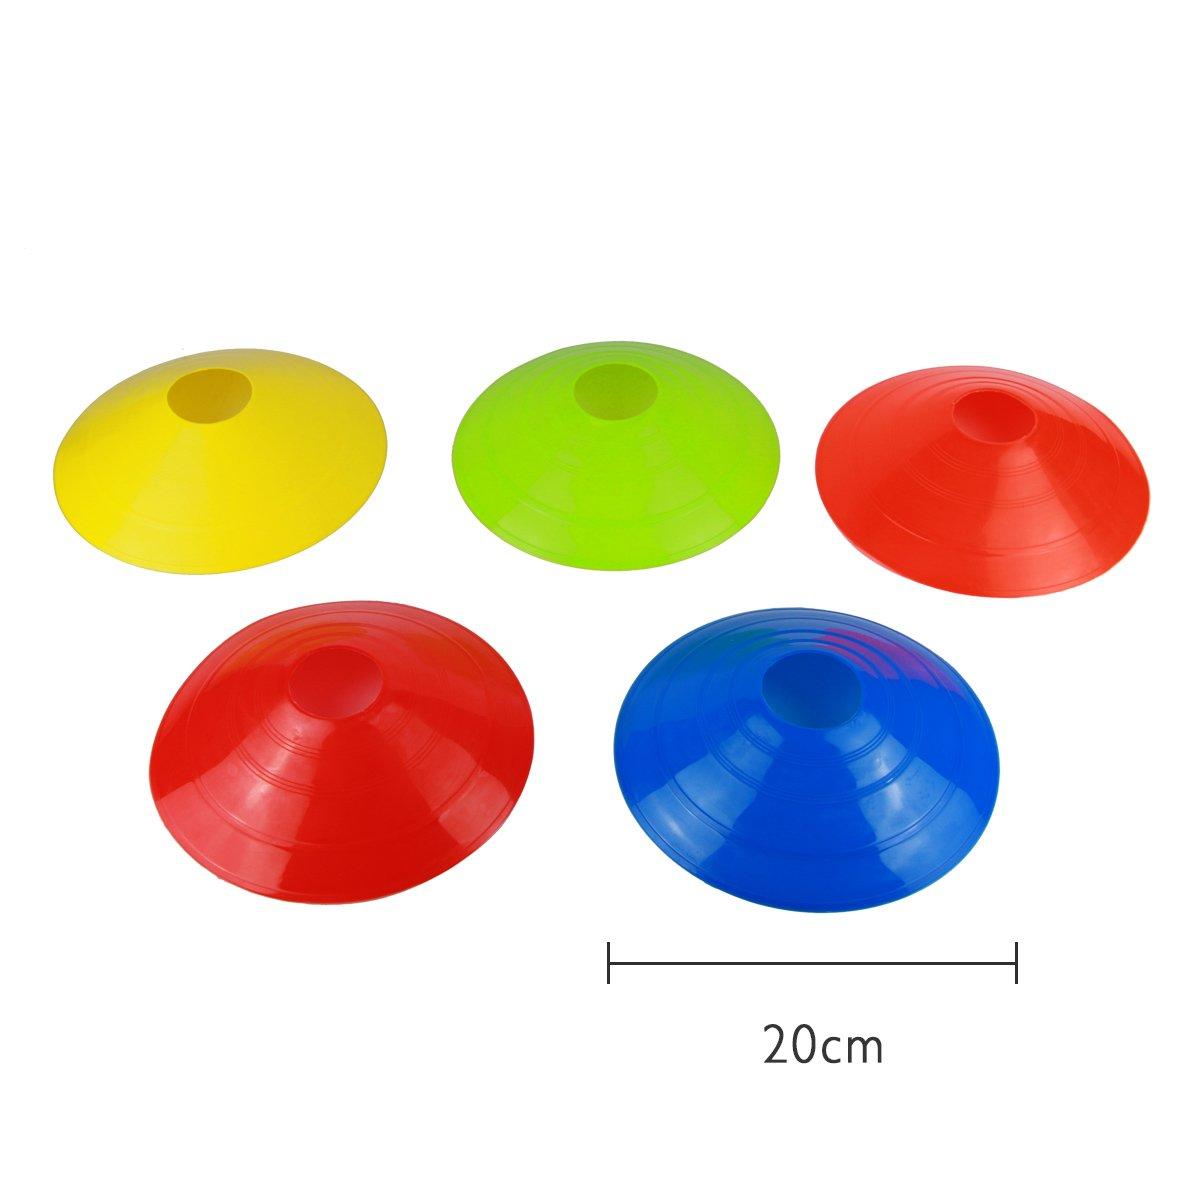 EASE 10/pcs Soccer Ball Espace marqueurs C/ônes de sport Running Football Rugby Fitness lagilit/é dentra/înement